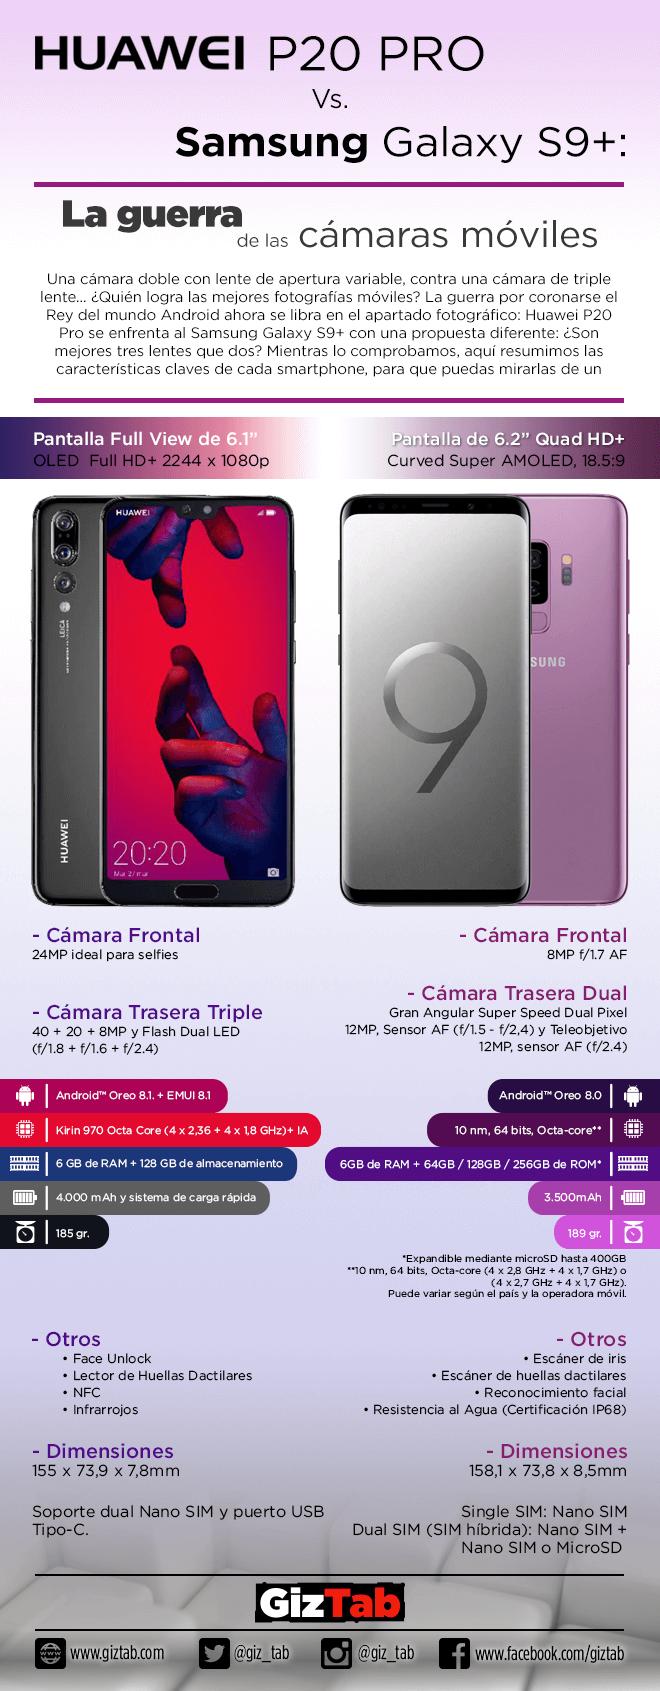 Huawei P20 Pro Vs. Samsung Galaxy S9+